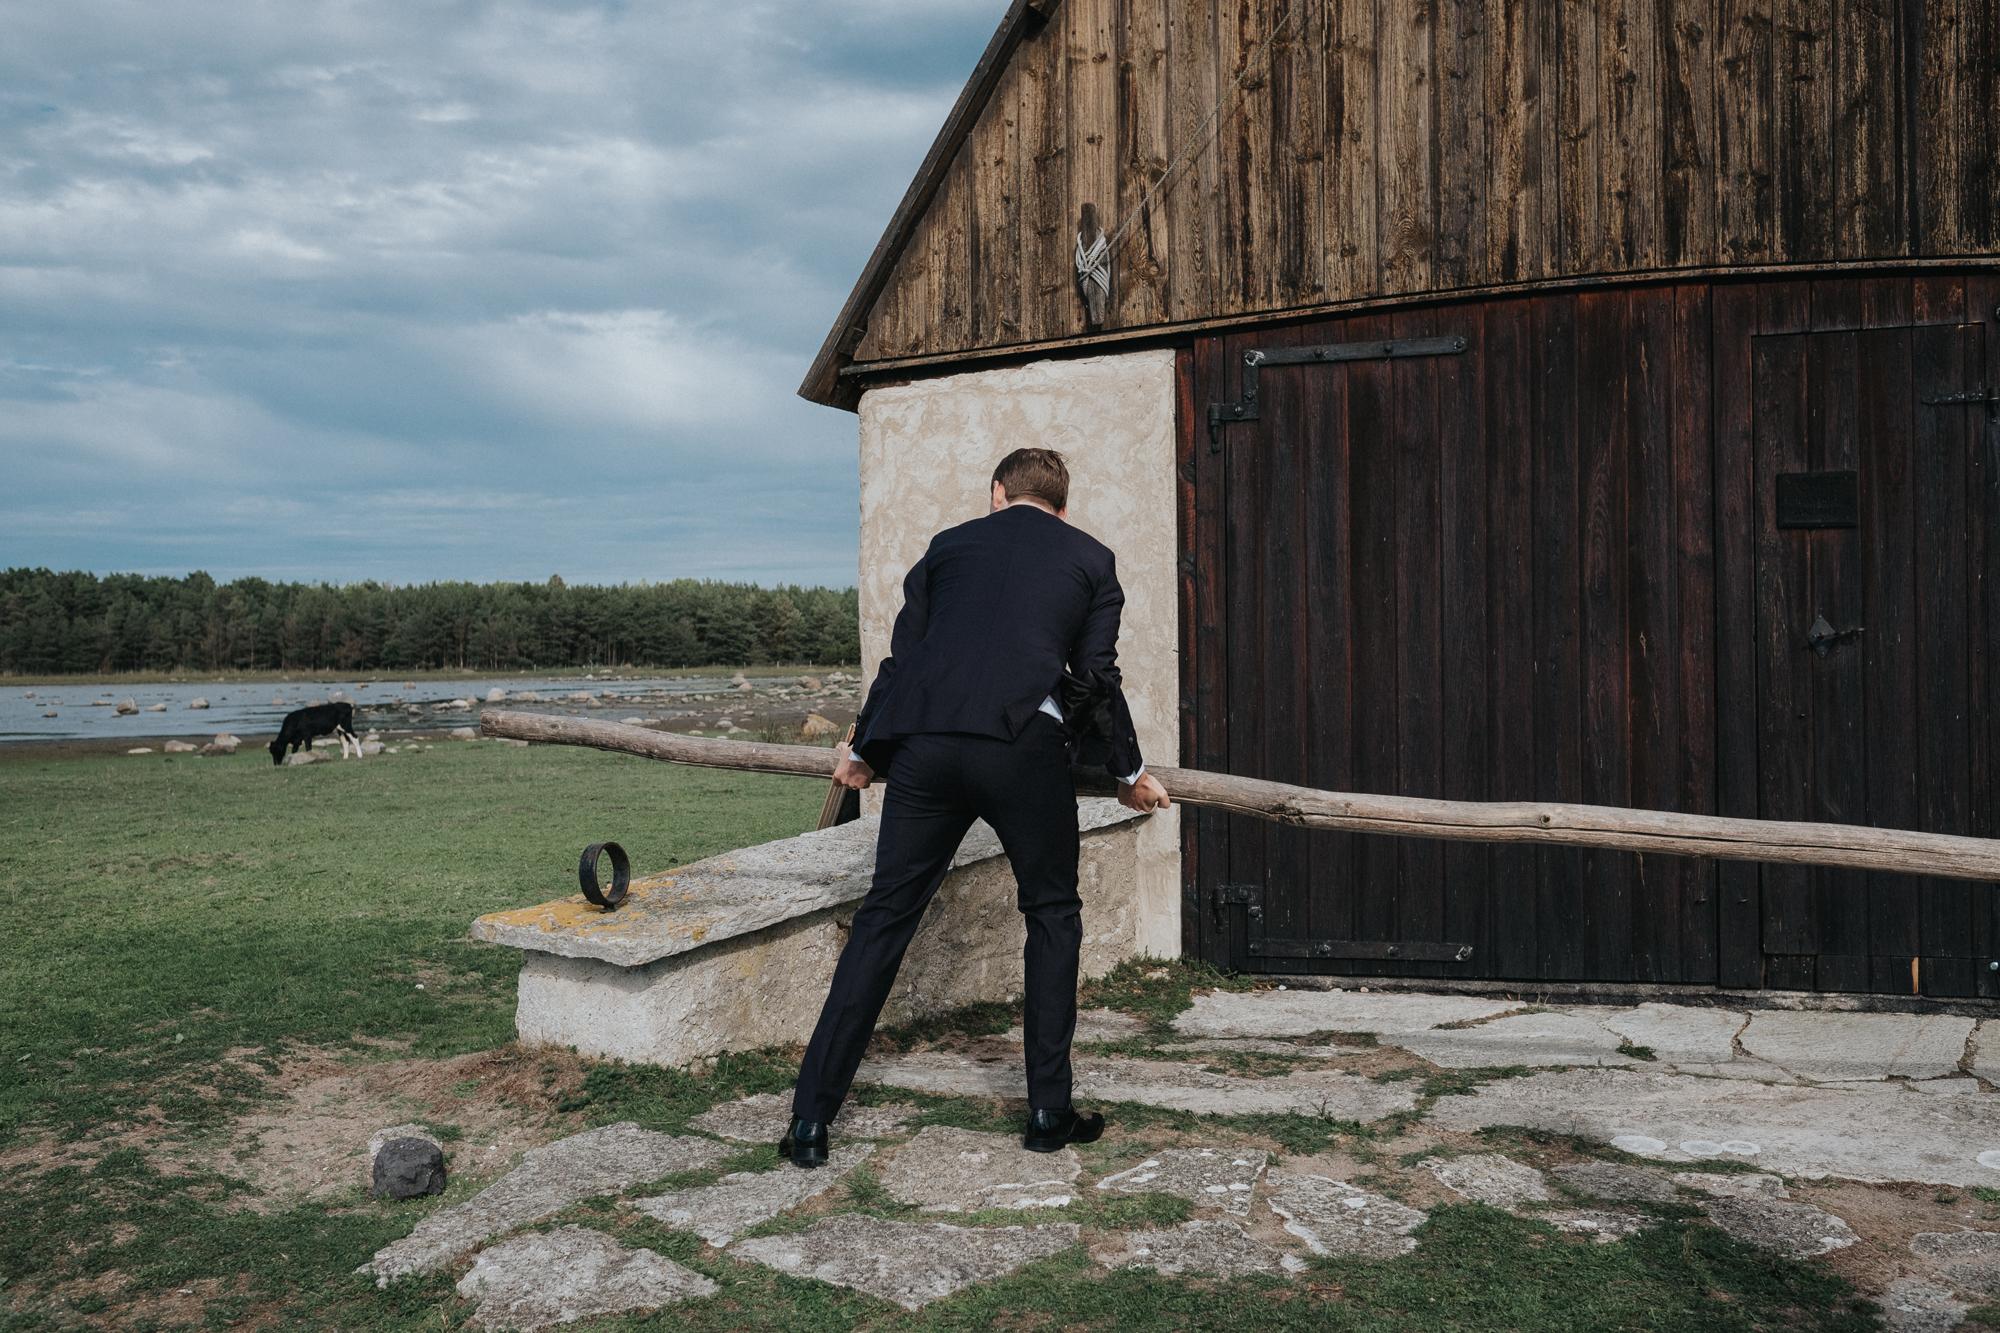 030-bröllopsfotograf-gotland-neas-fotografi kopia.jpg